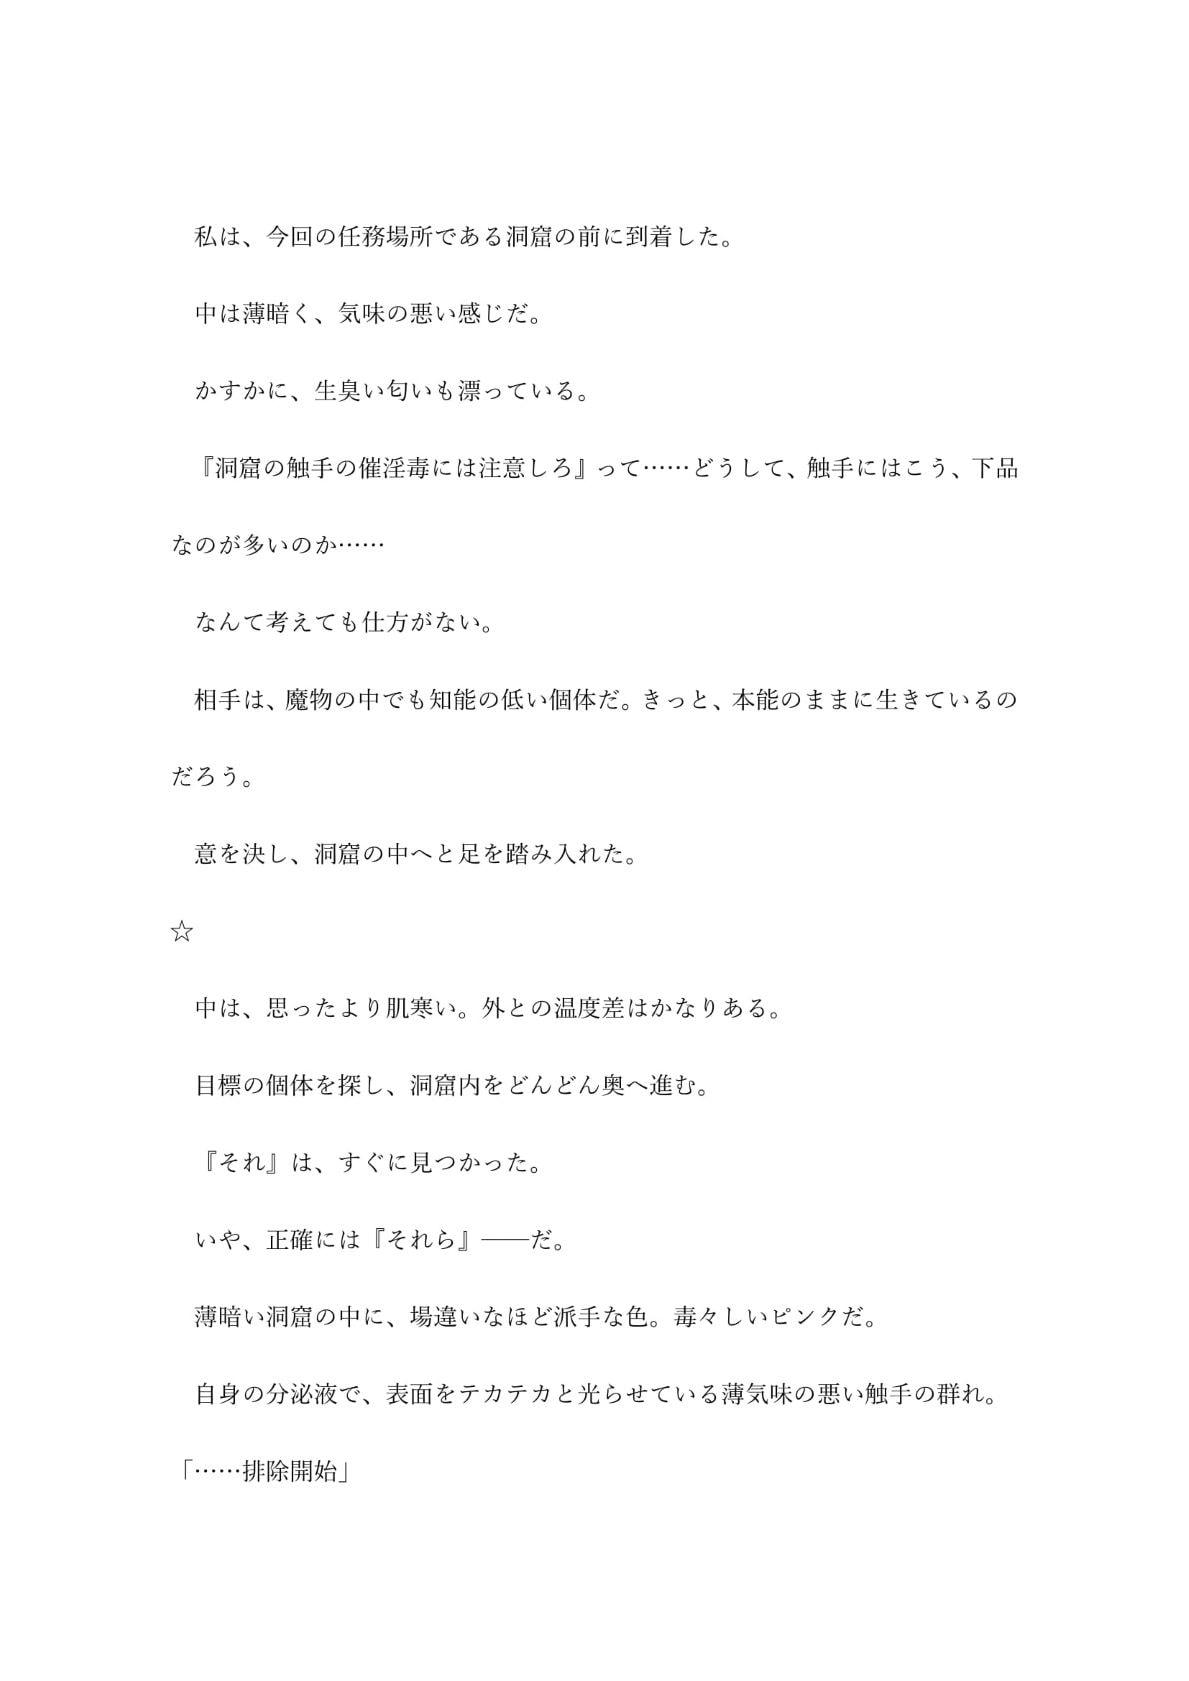 RJ319966 魔物ハンターレポート~vs催淫毒の触手~ [20210307]